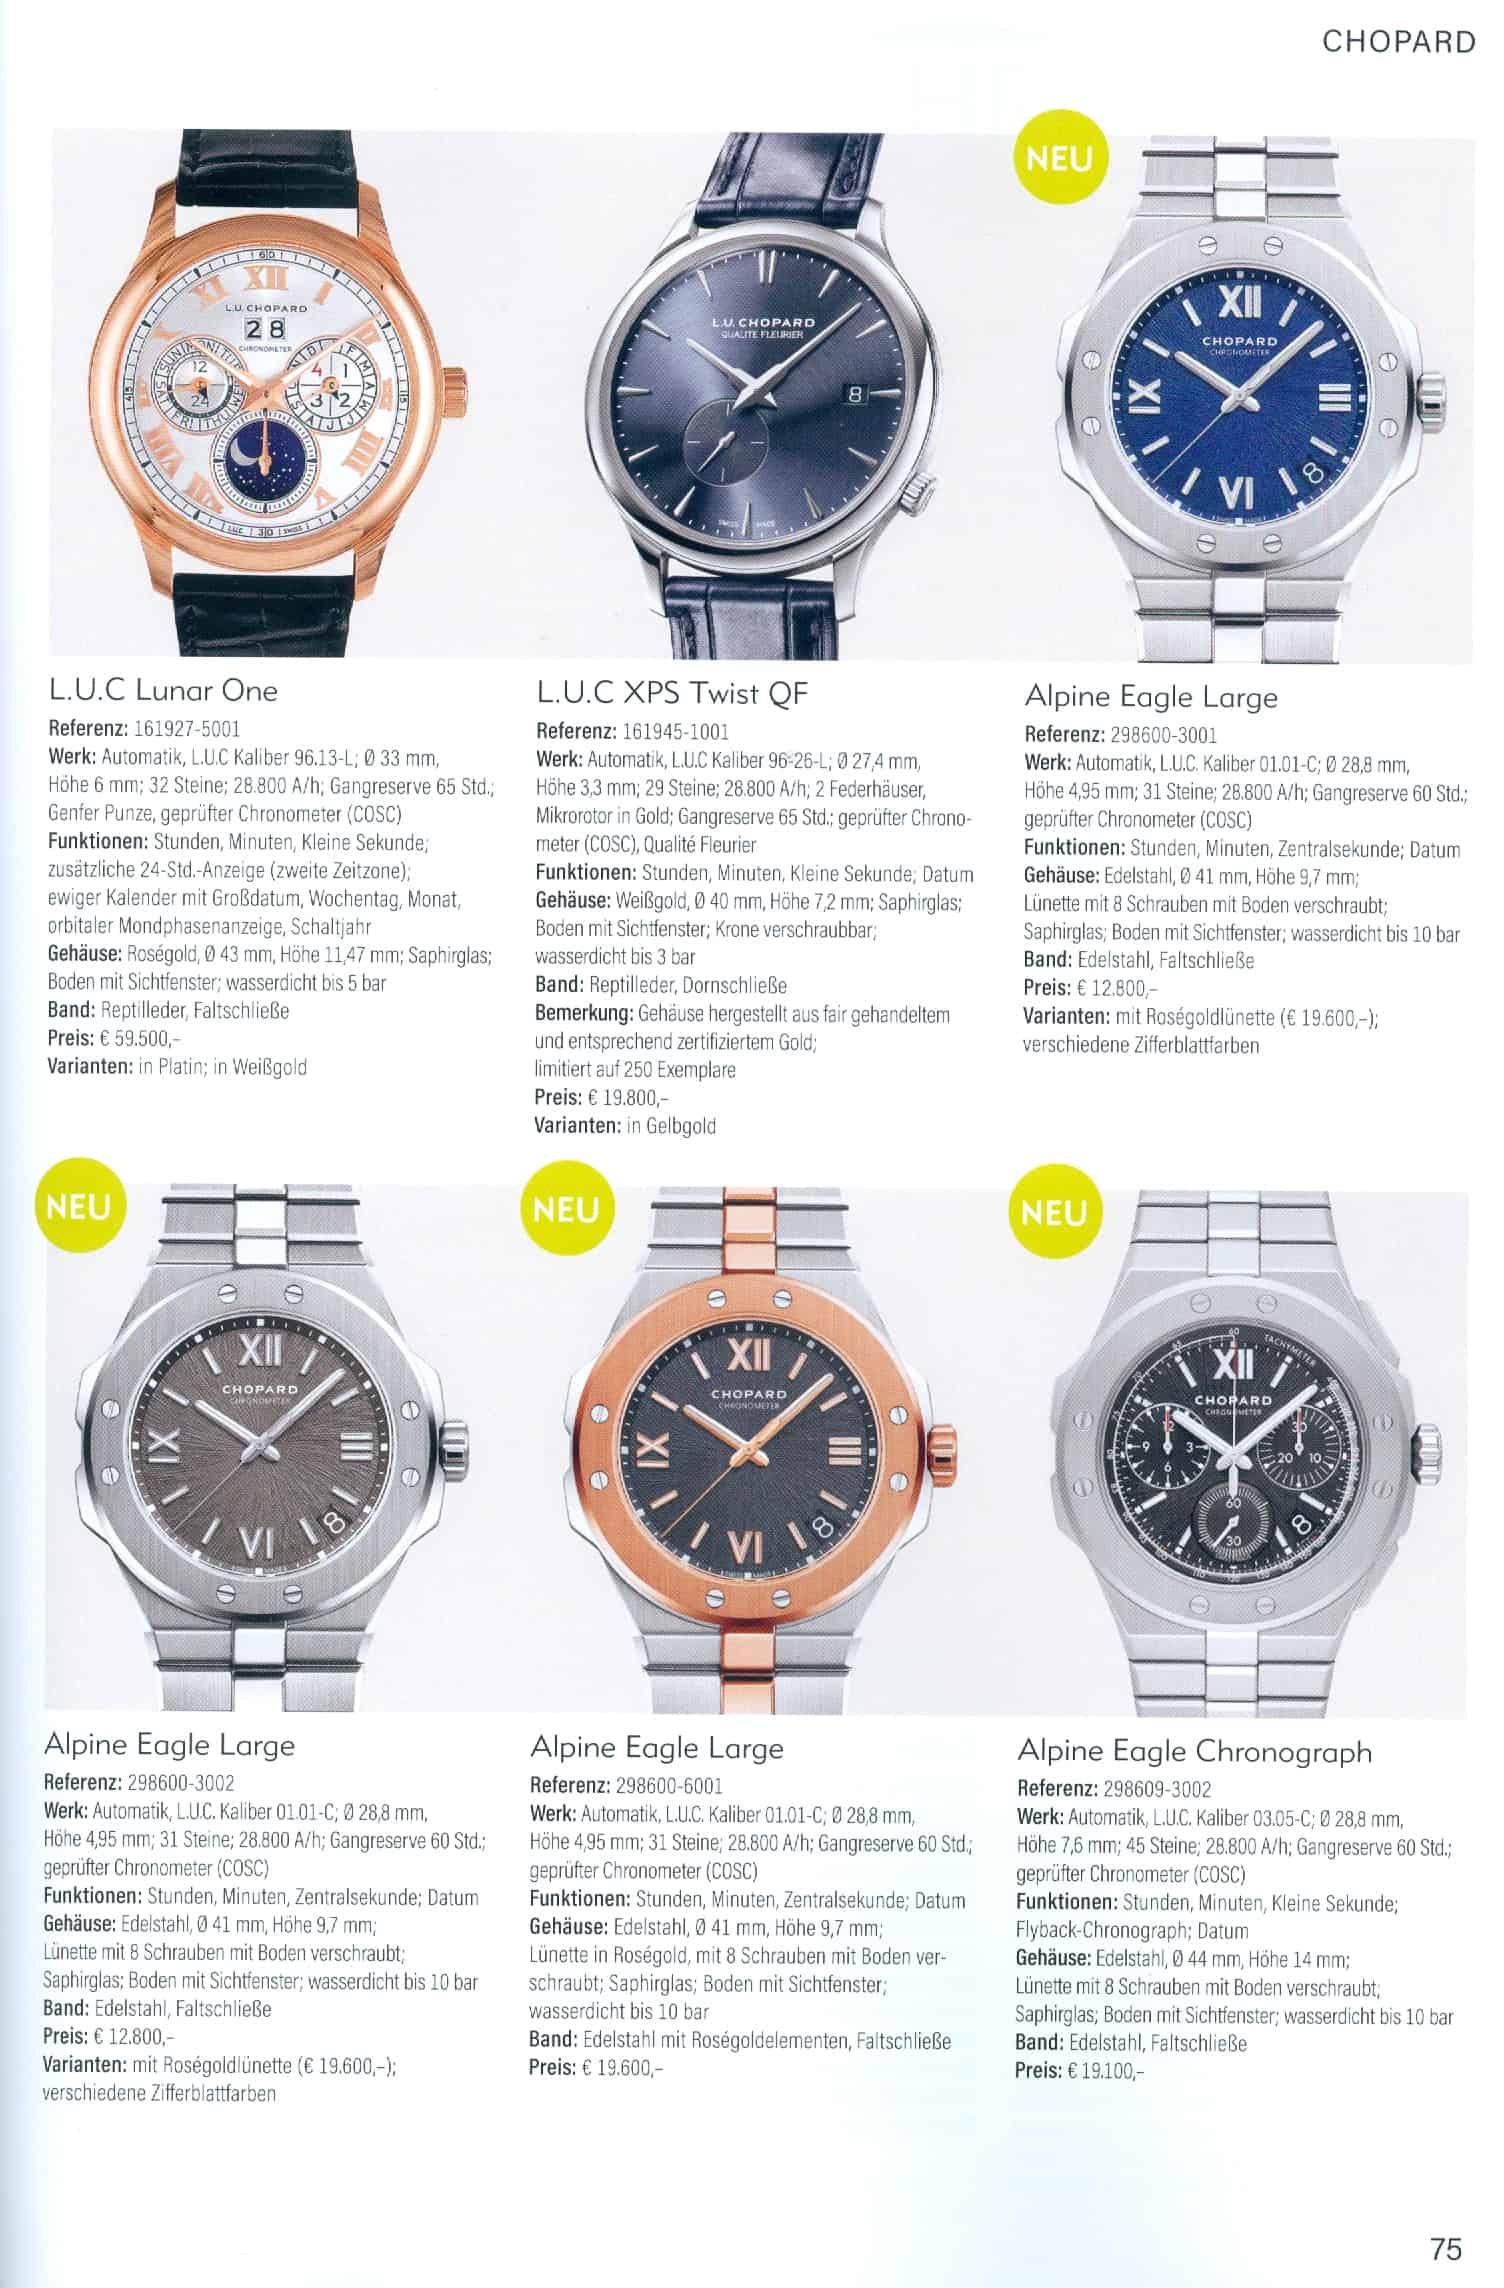 Armbanduhren Katalog Heel Verlag 2020 2021 Chopard